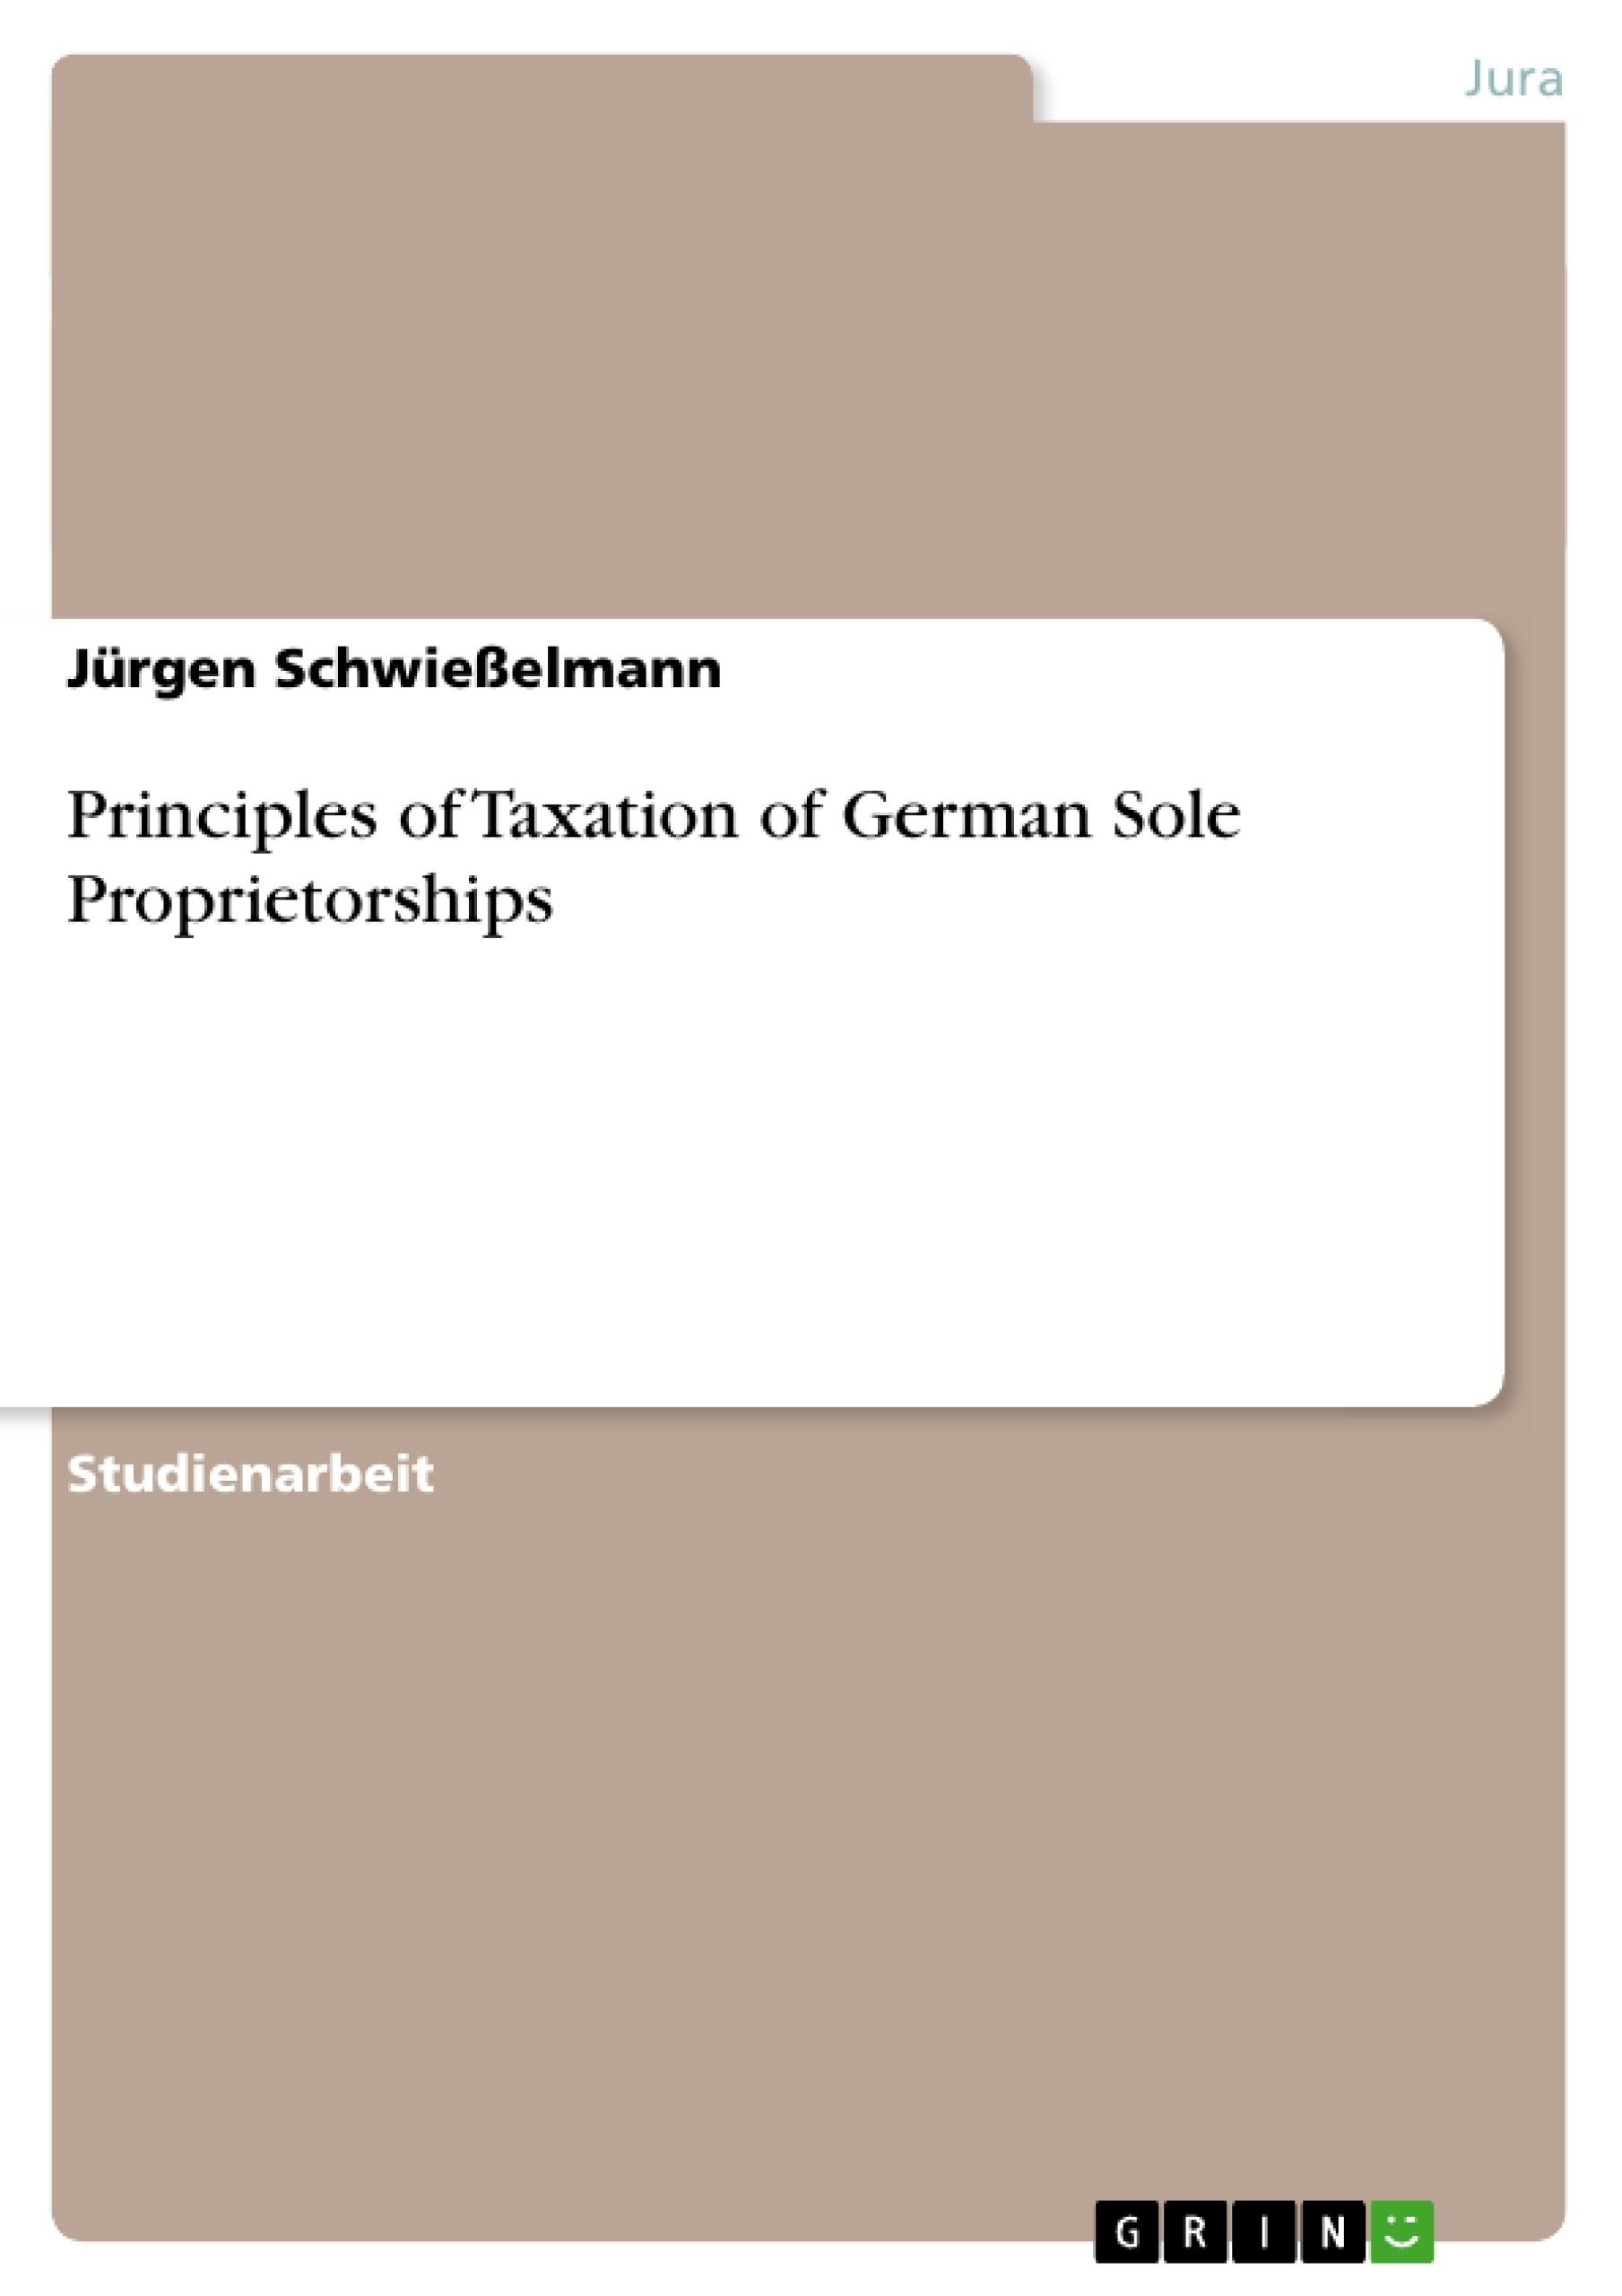 Titel: Principles of Taxation of German Sole Proprietorships